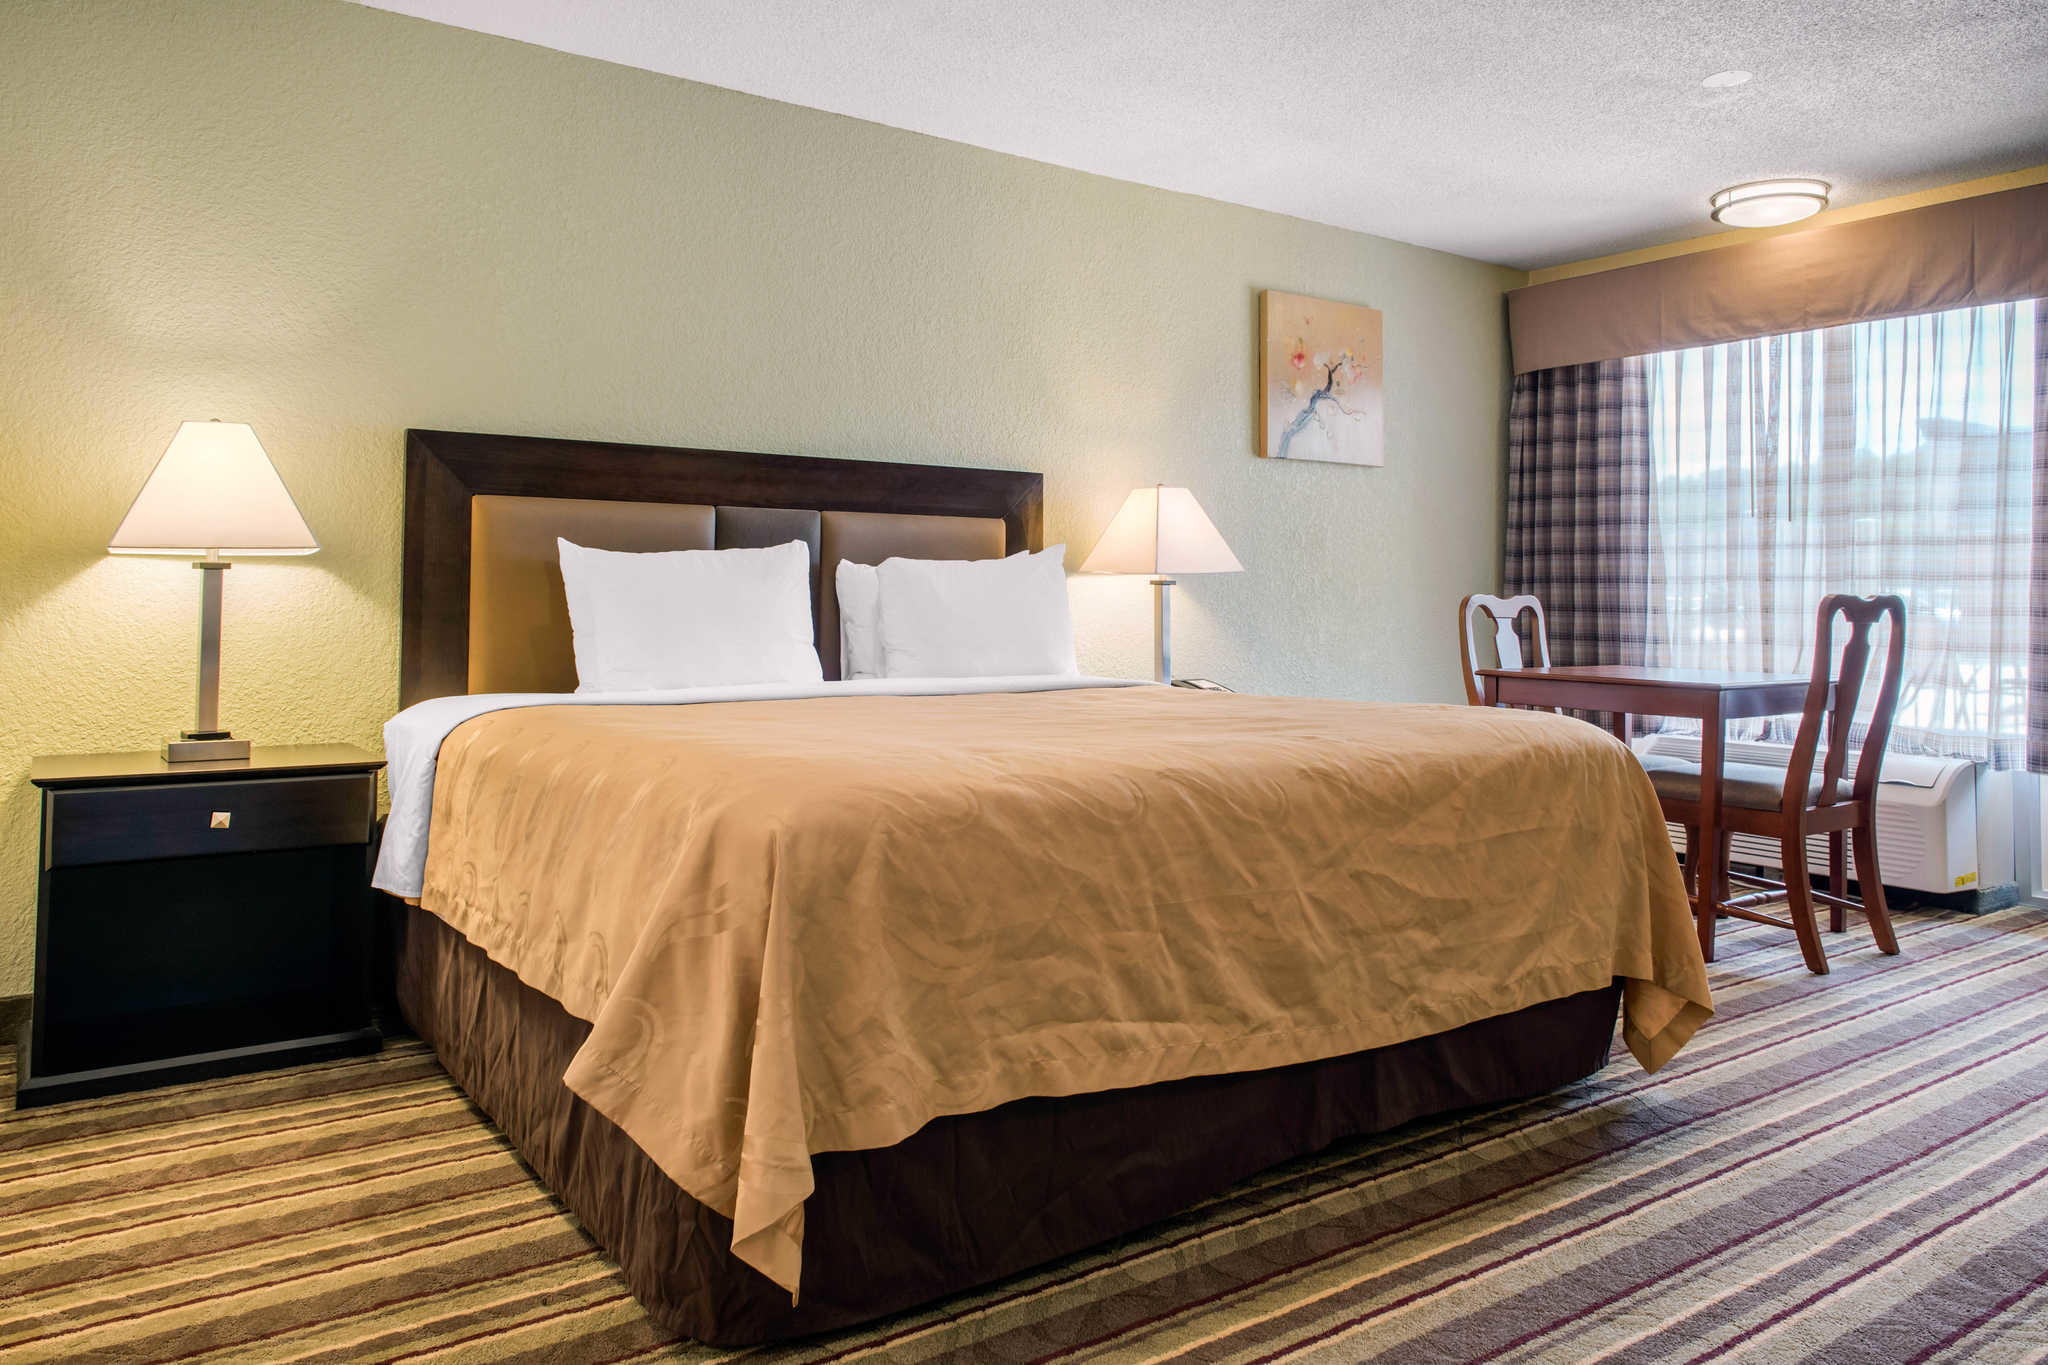 Quality Inn image 23